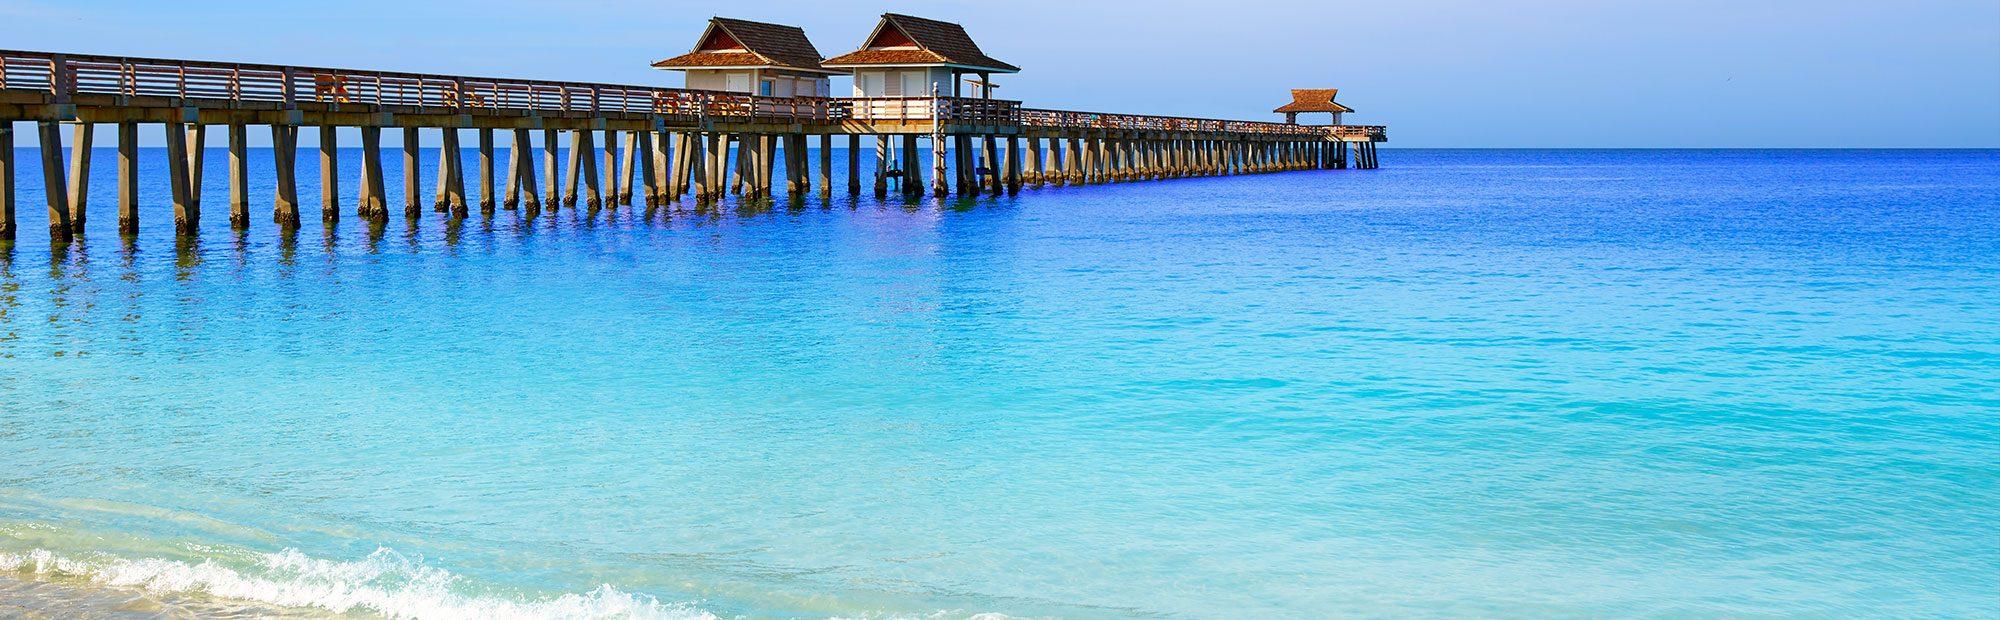 Naples Pier in Naples Florida